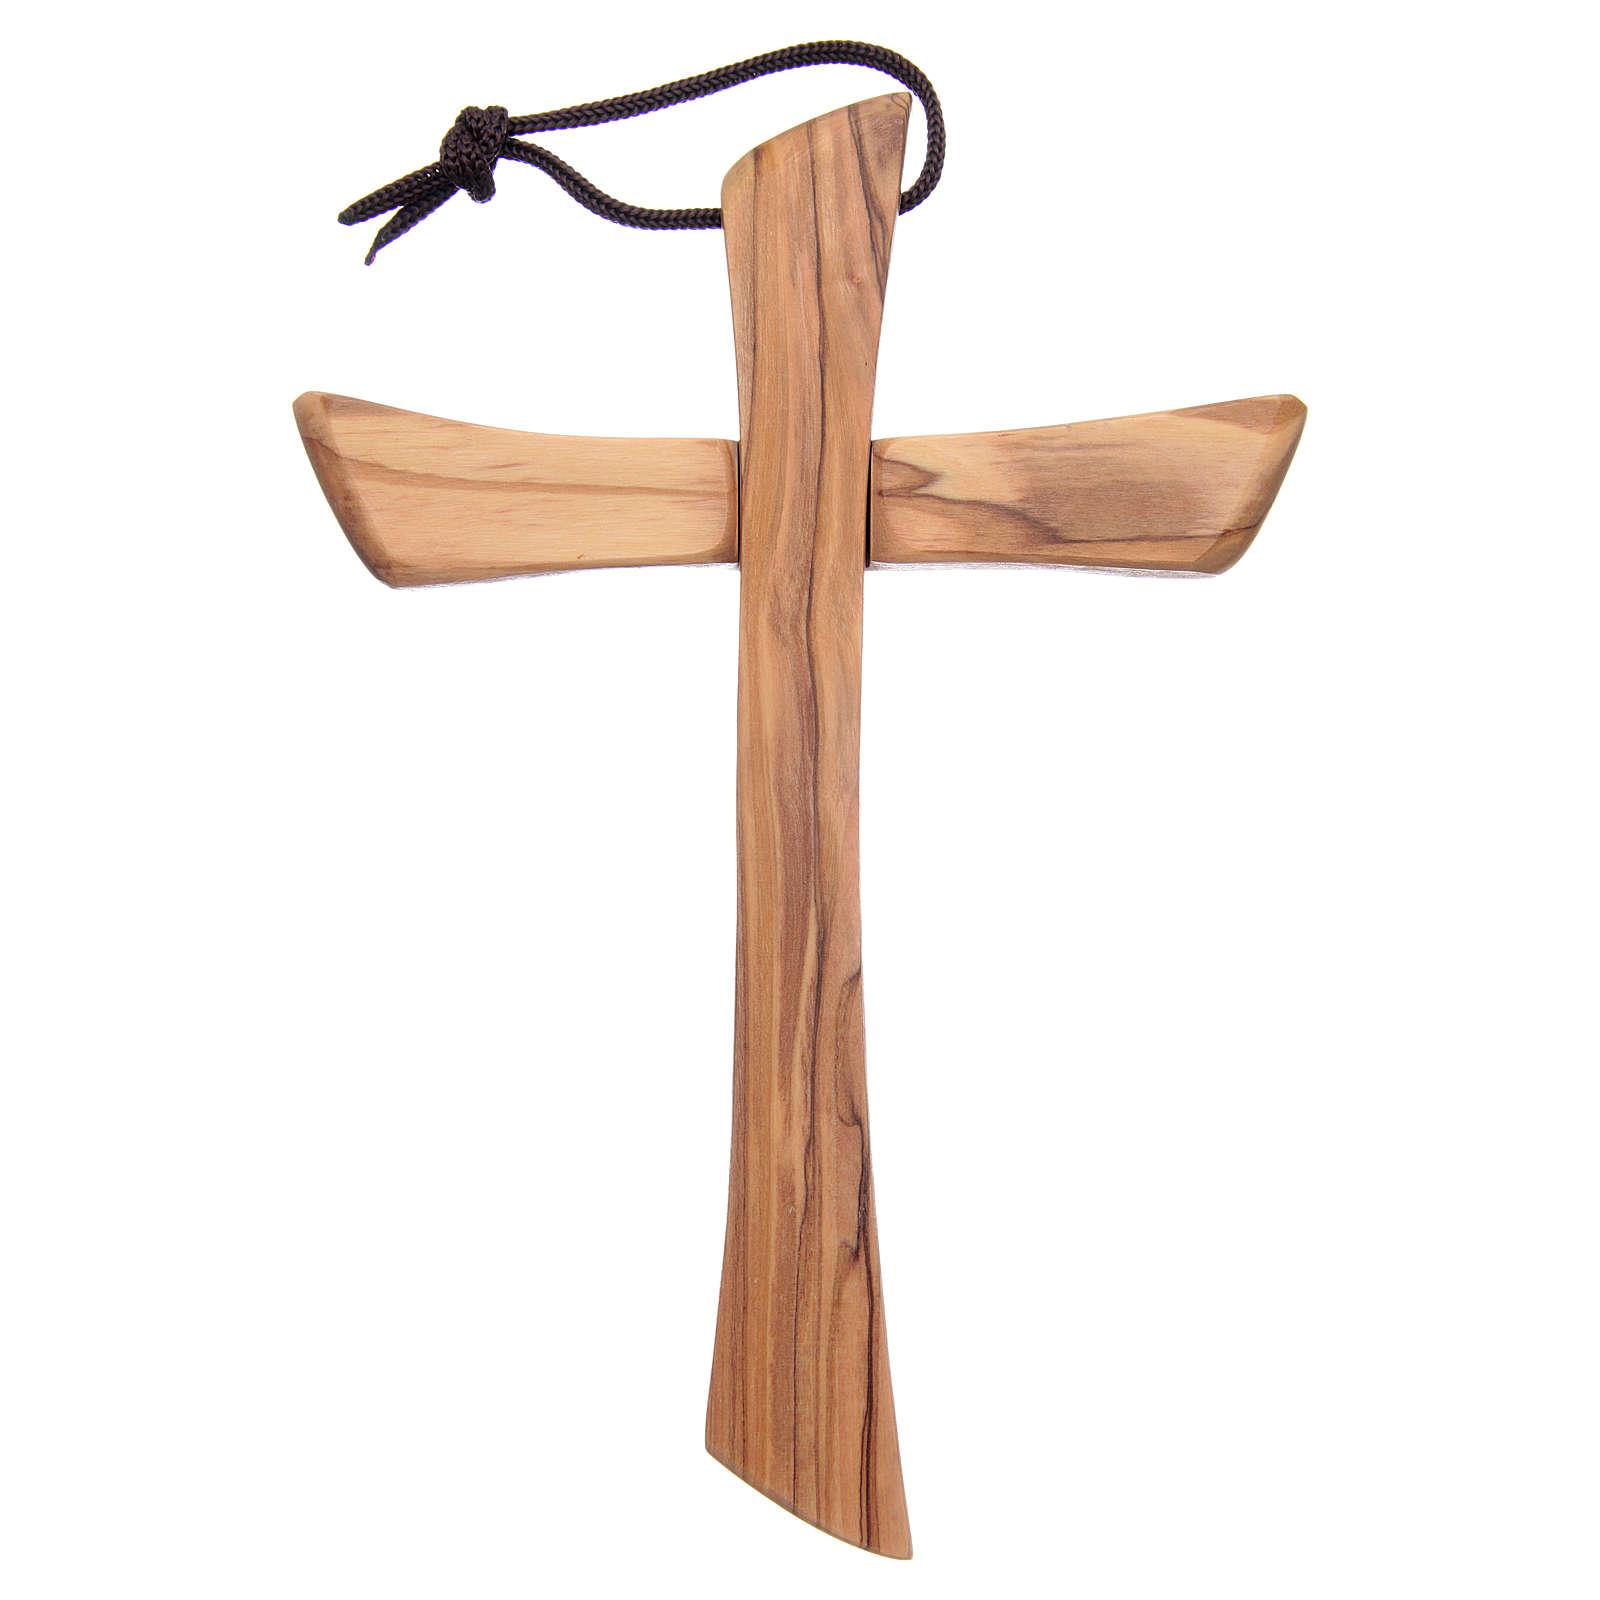 Croix terre sainte, bois d'olivier naturel bord arrondi 4